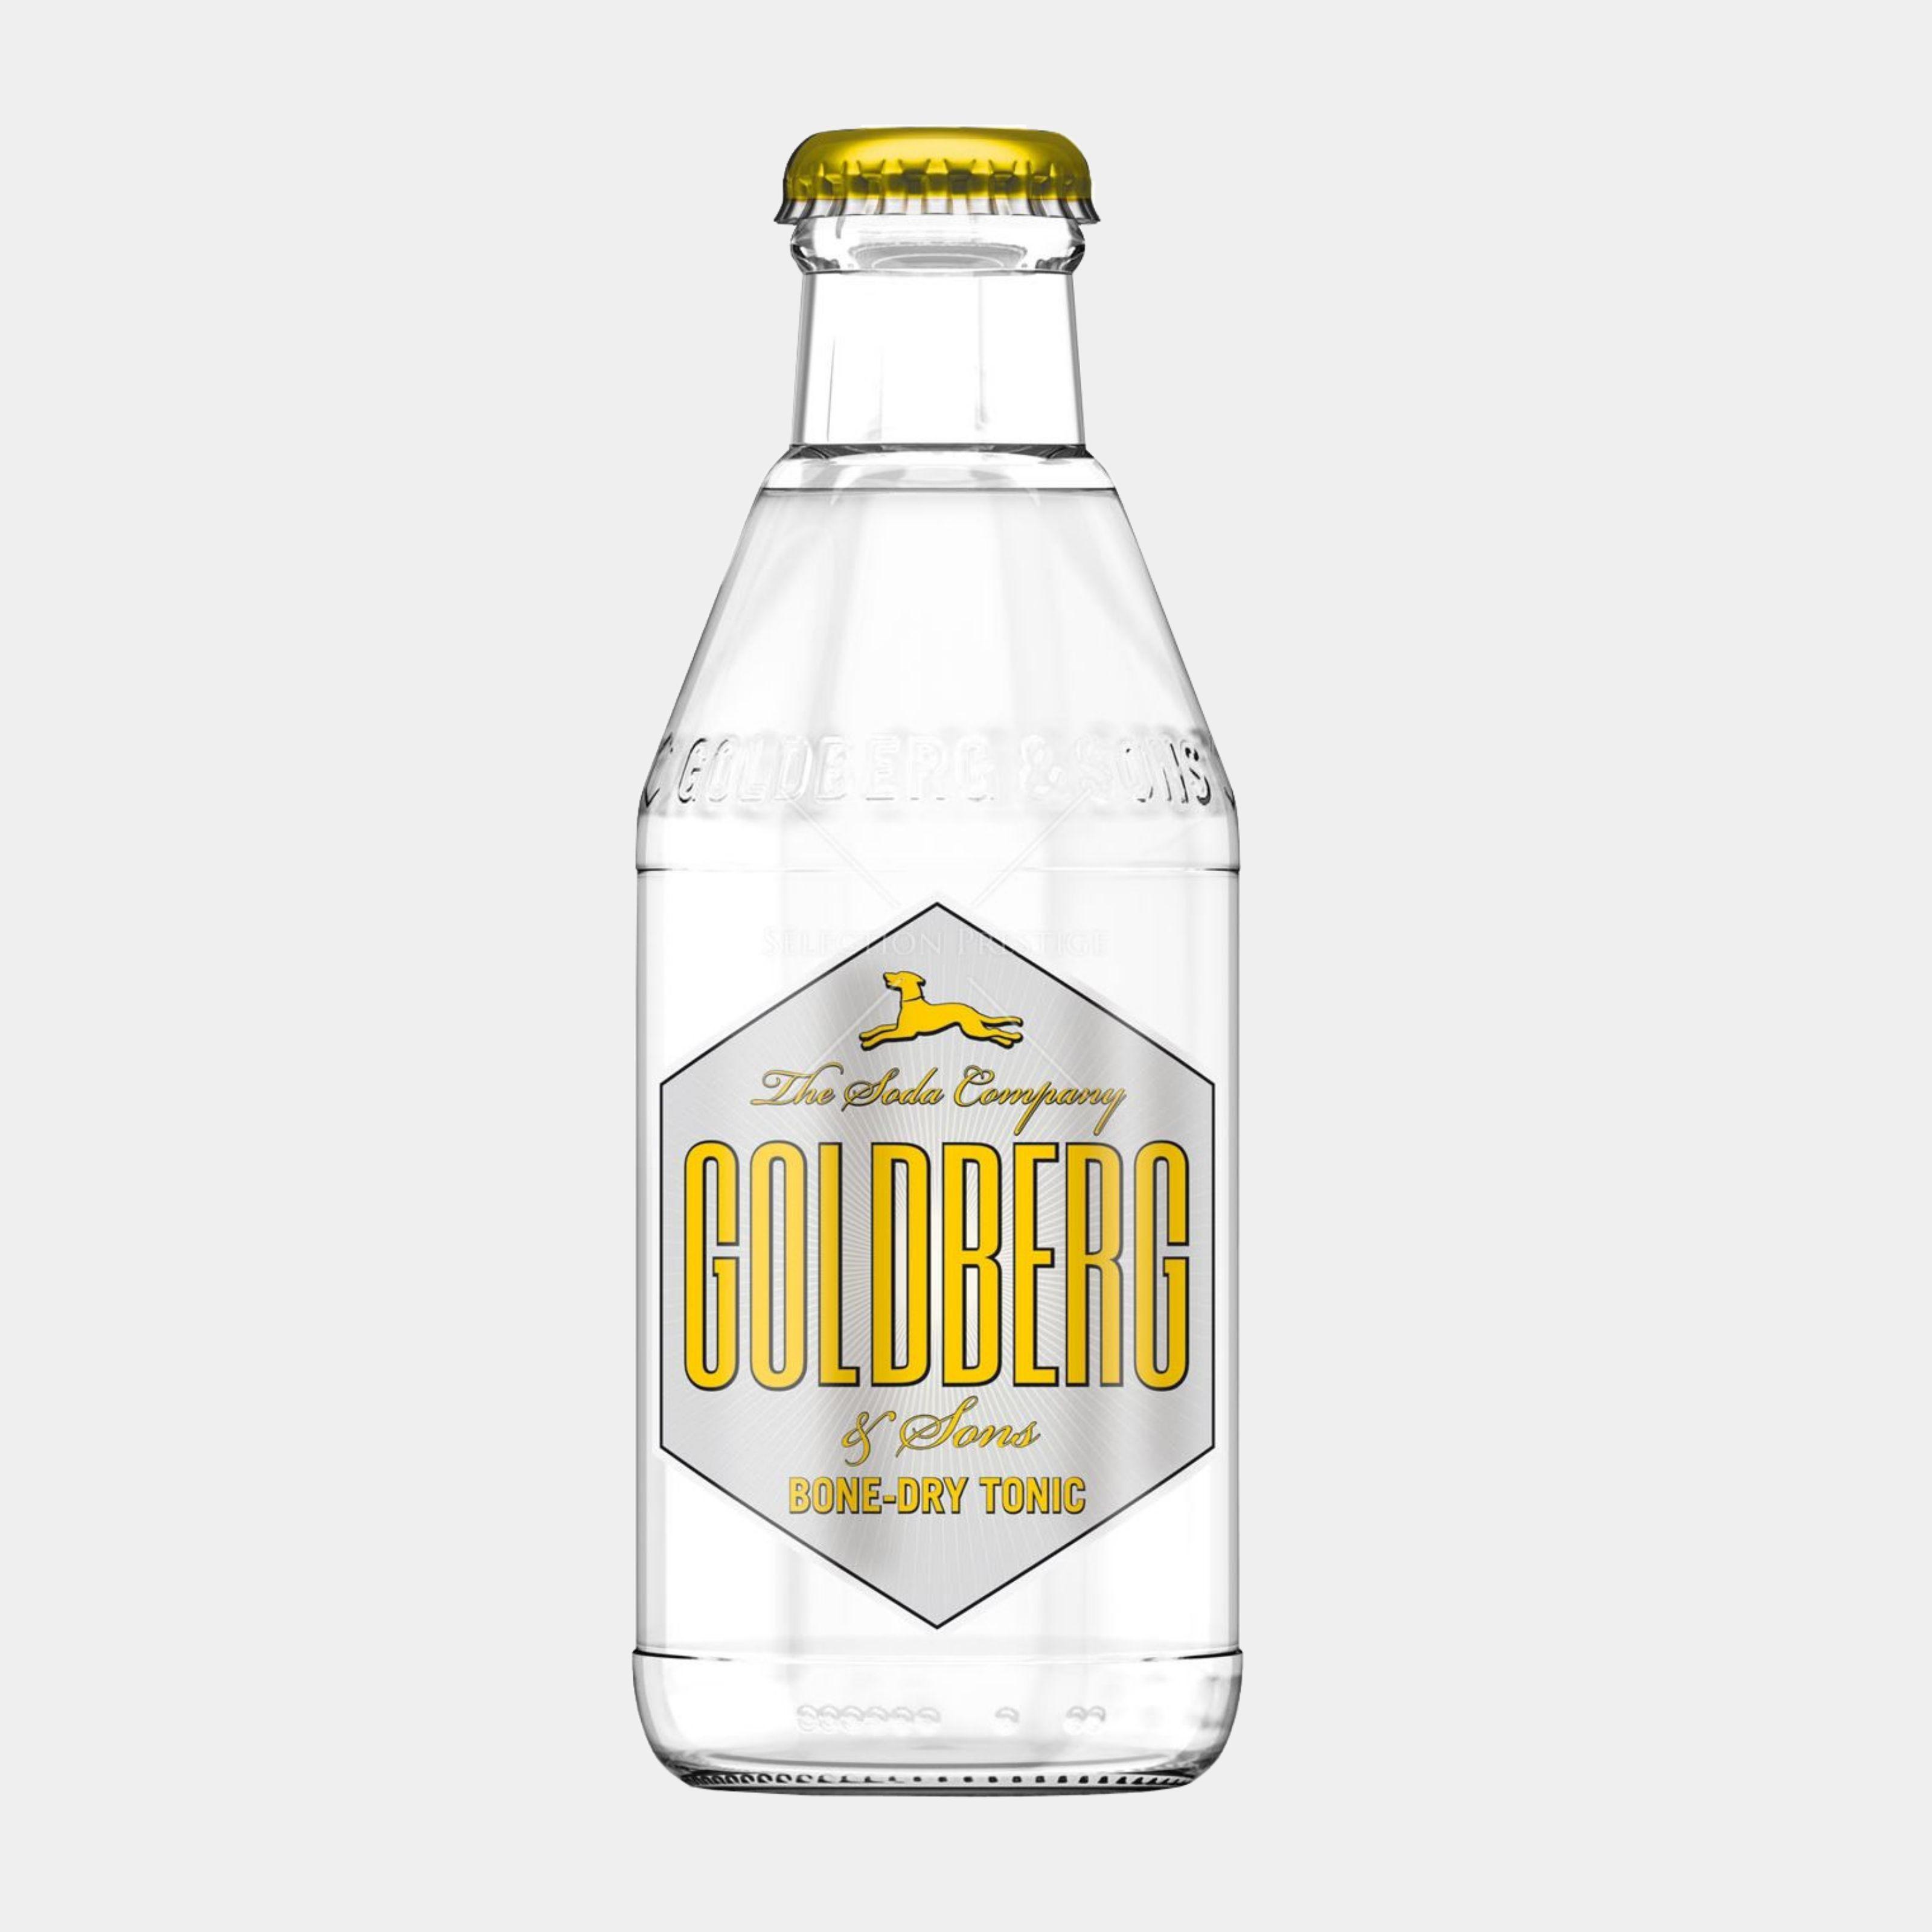 Goldberg Bone Dry Tonic 0.2L